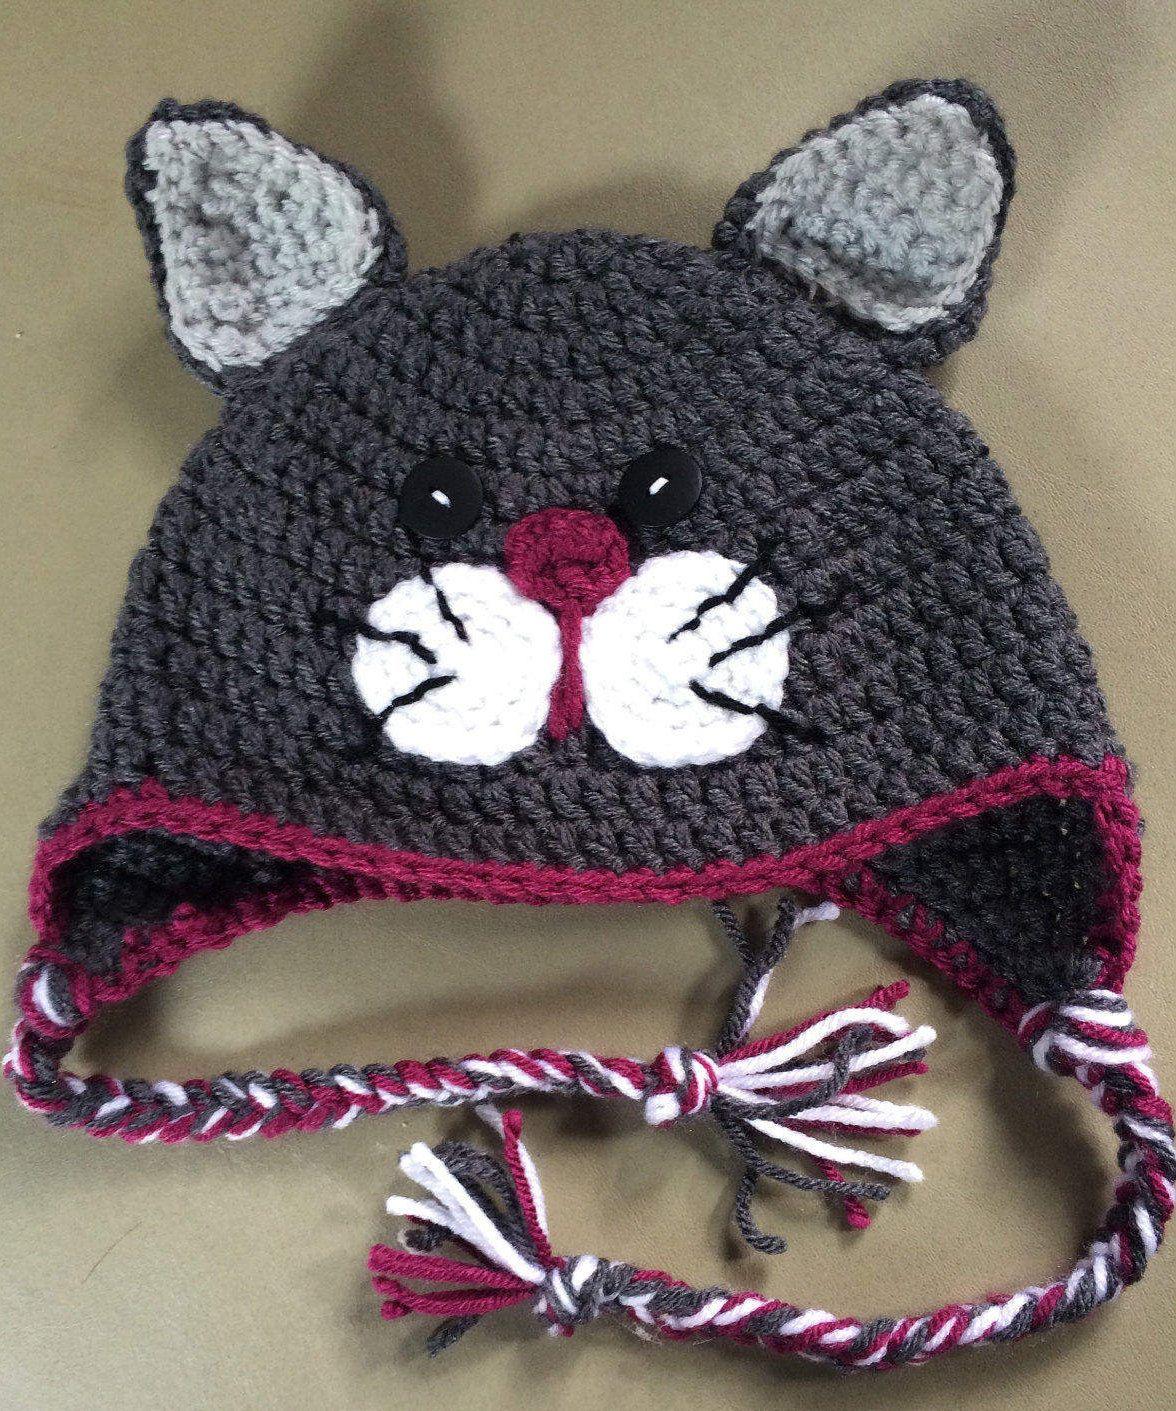 Crochet Cat Hat Child Hat Cat Hat Grey Crochet Hat Winter Hat Child Scrochet Hat Whimsey Cat Hat Winter Ear Flap Hat Character Hat Crochet Cat Hat Cat Hat Pattern Crochet Hats